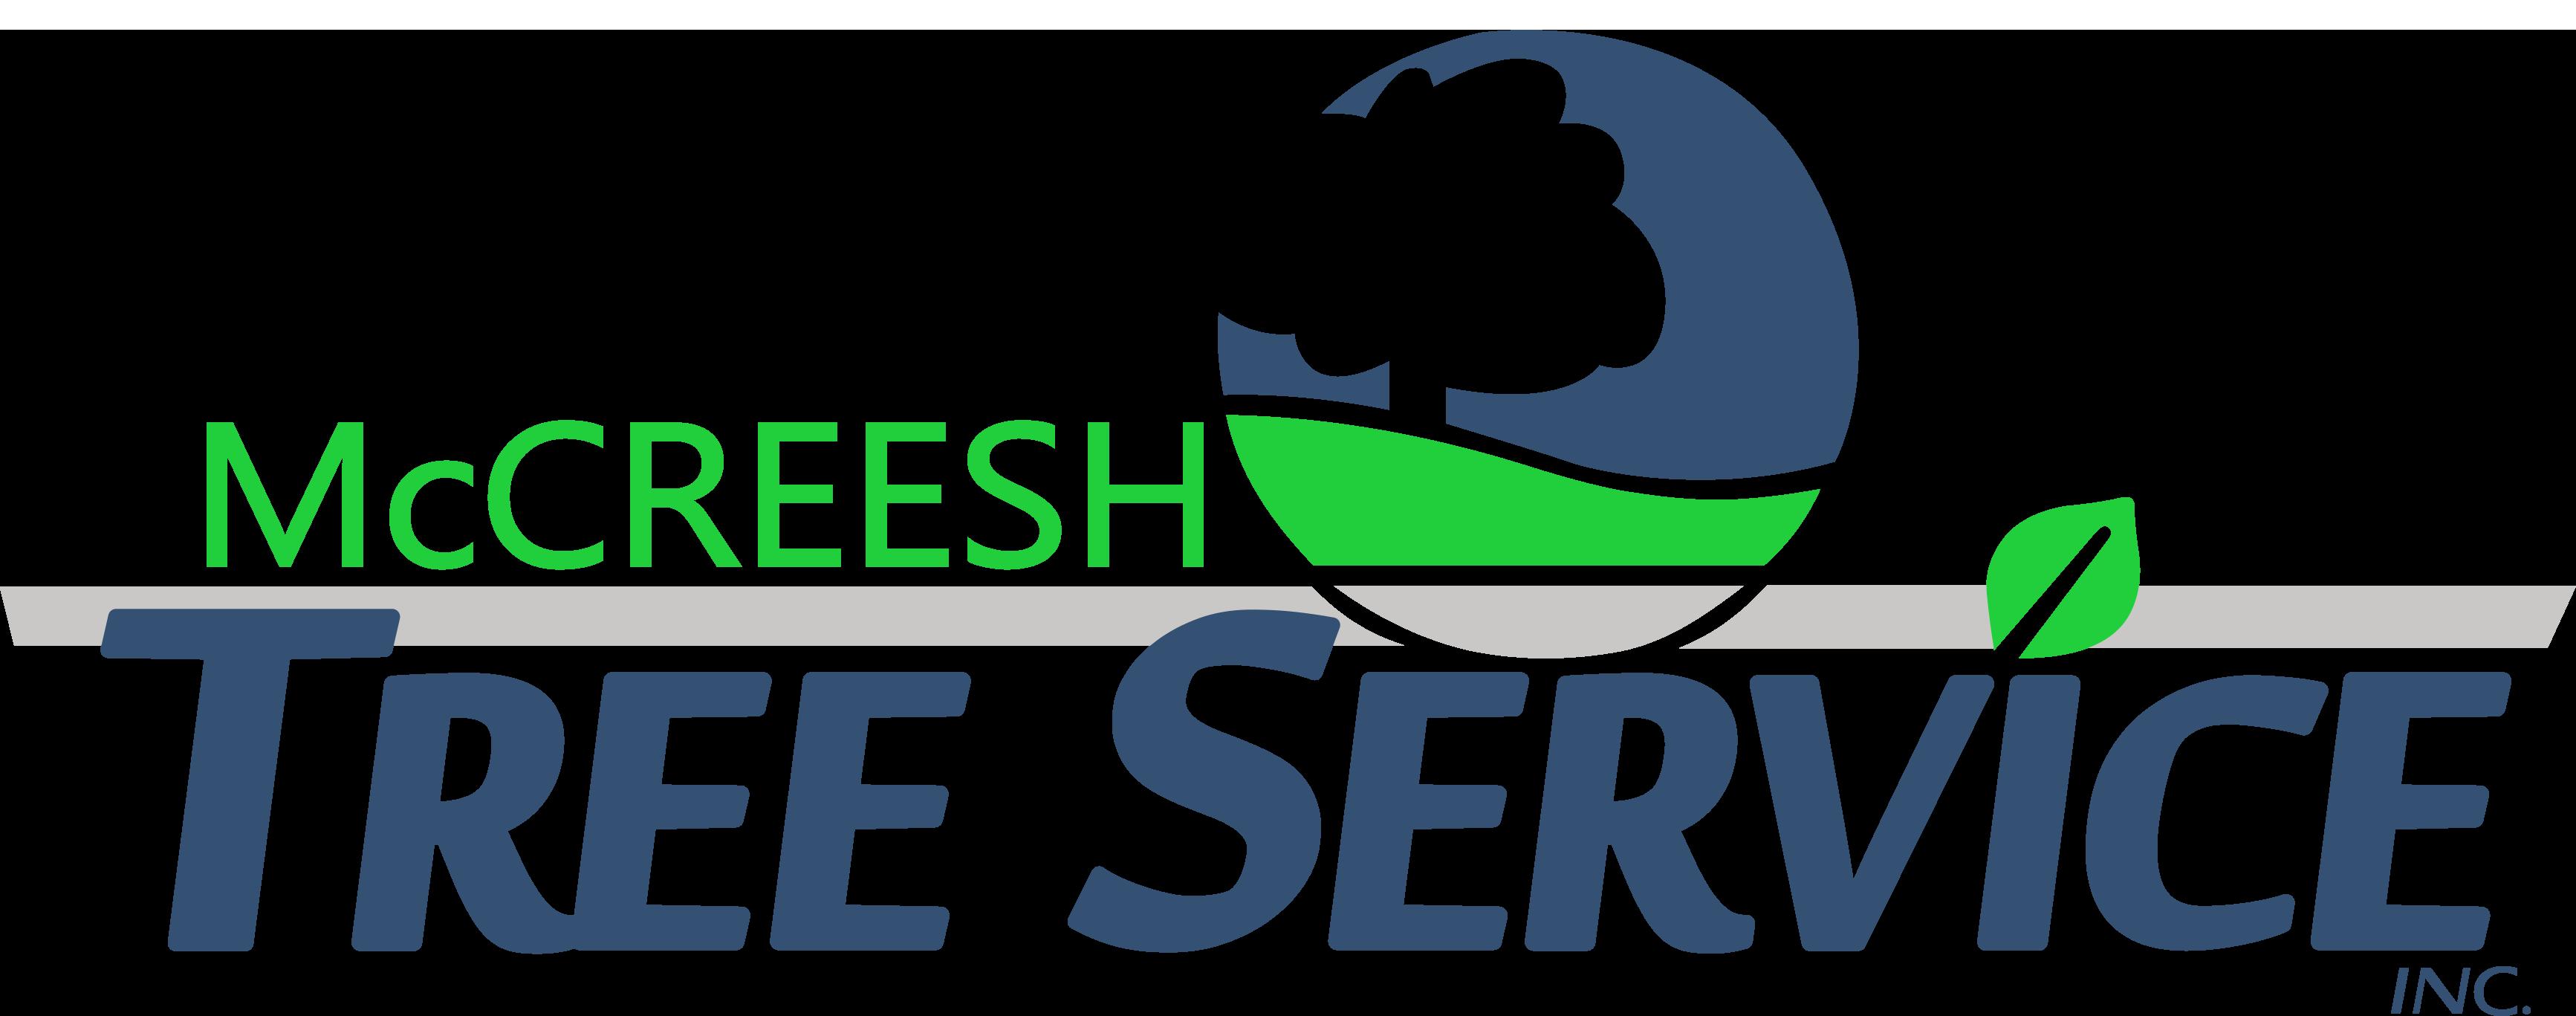 mccreesh-logo-6.27